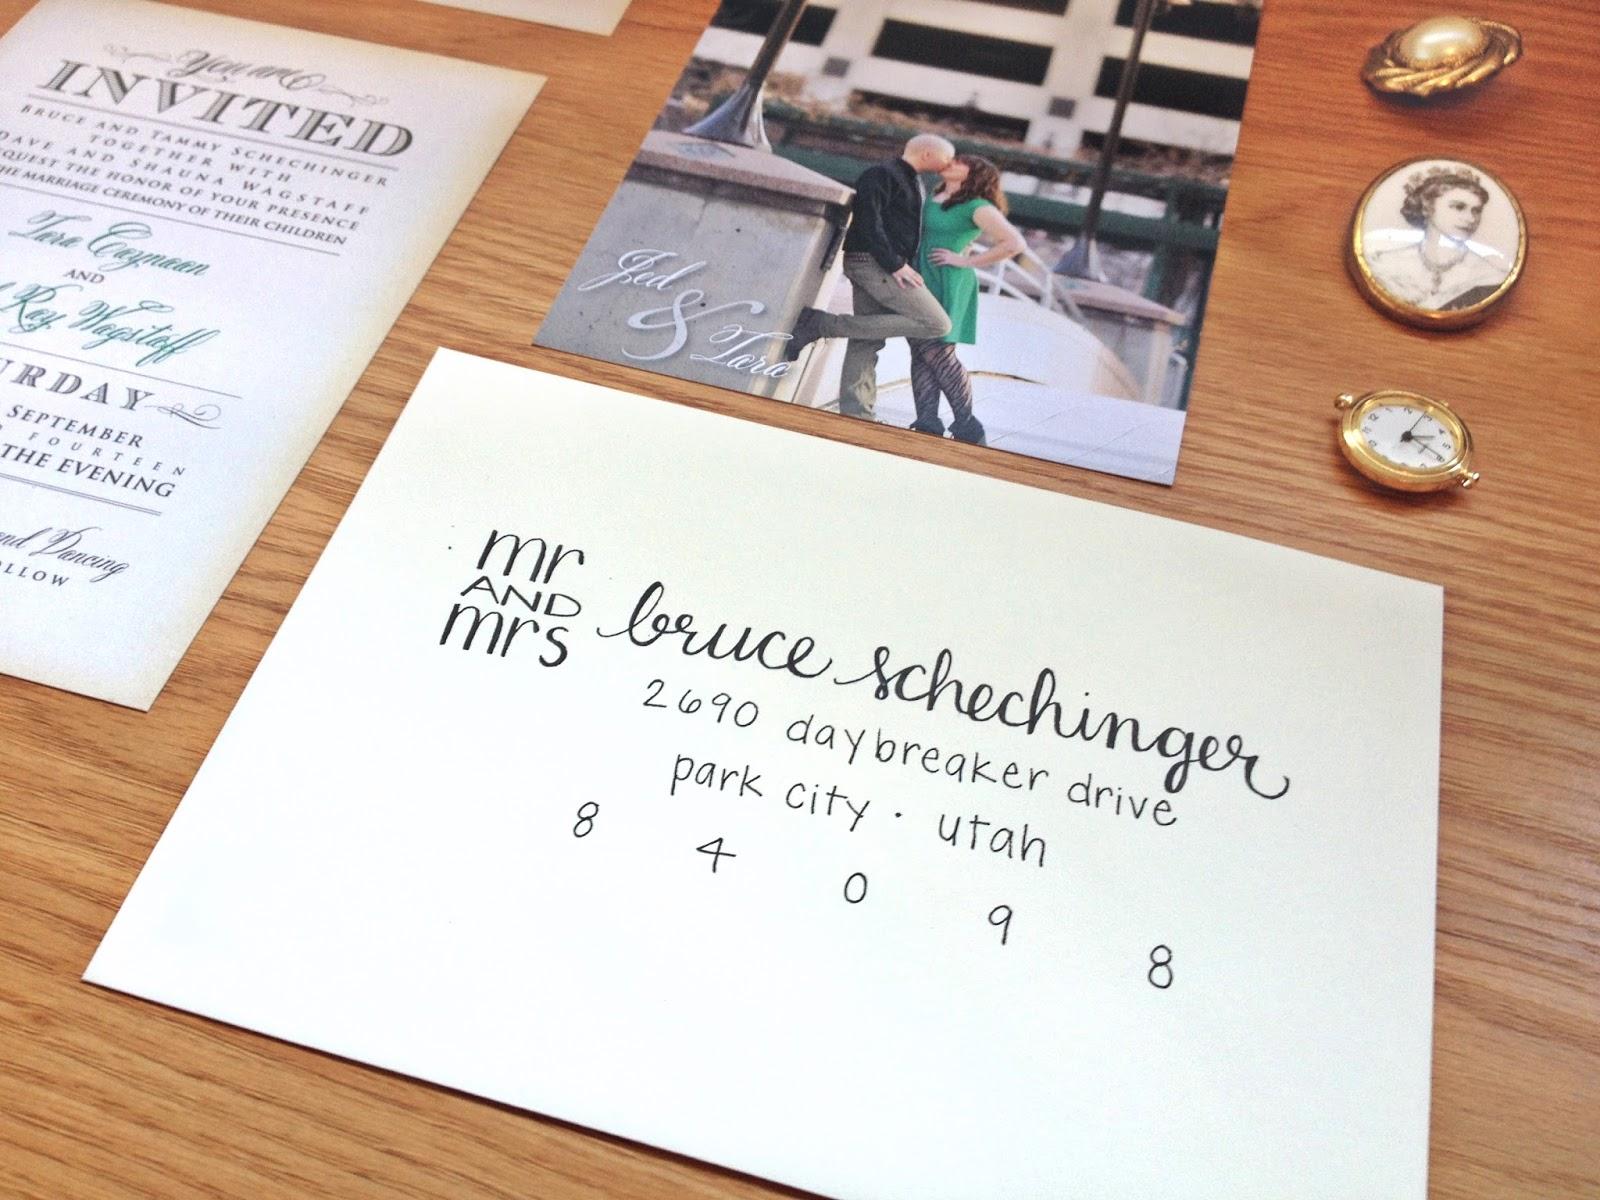 The Knot Addressing Wedding Invitations: : Wedding Invitation Envelope Addressing